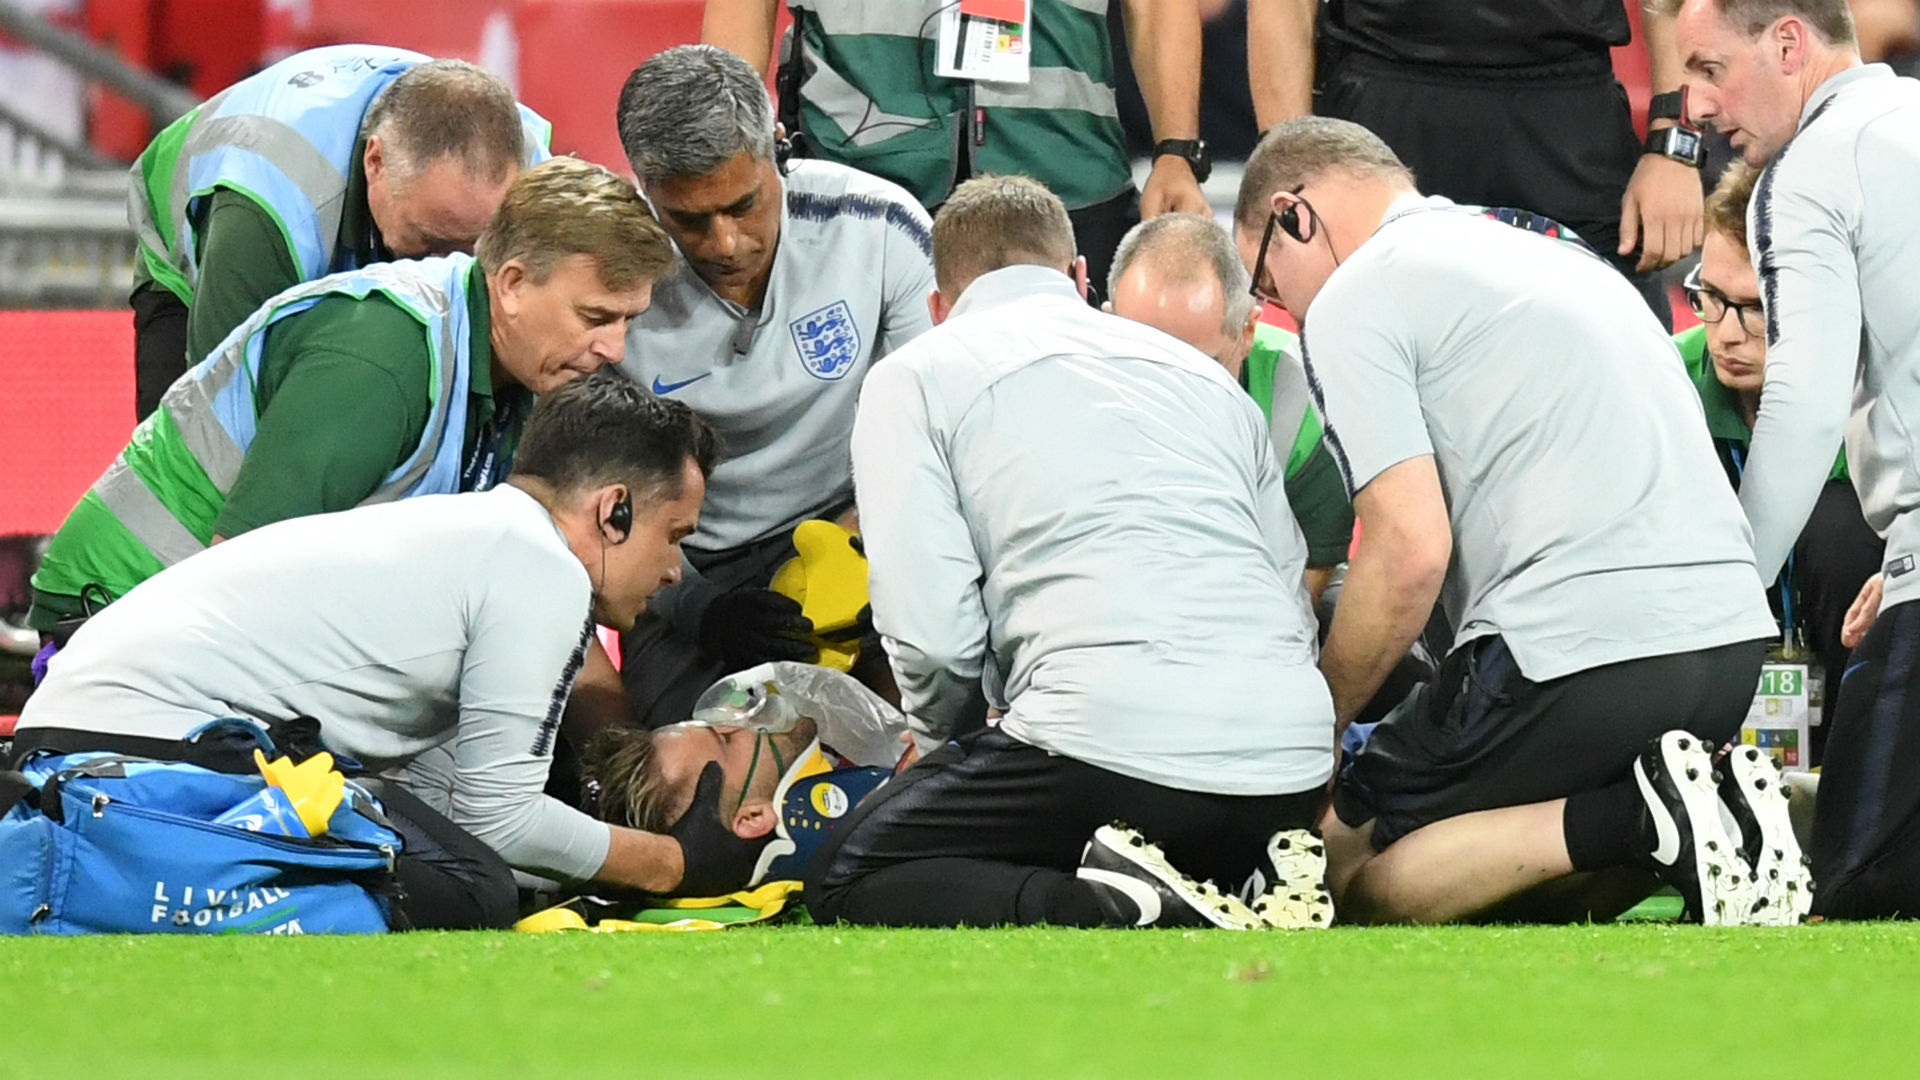 Image result for ชอว์ฟื้นตัวหลังหัวกระแทกพื้นเกมพ่ายสเปน